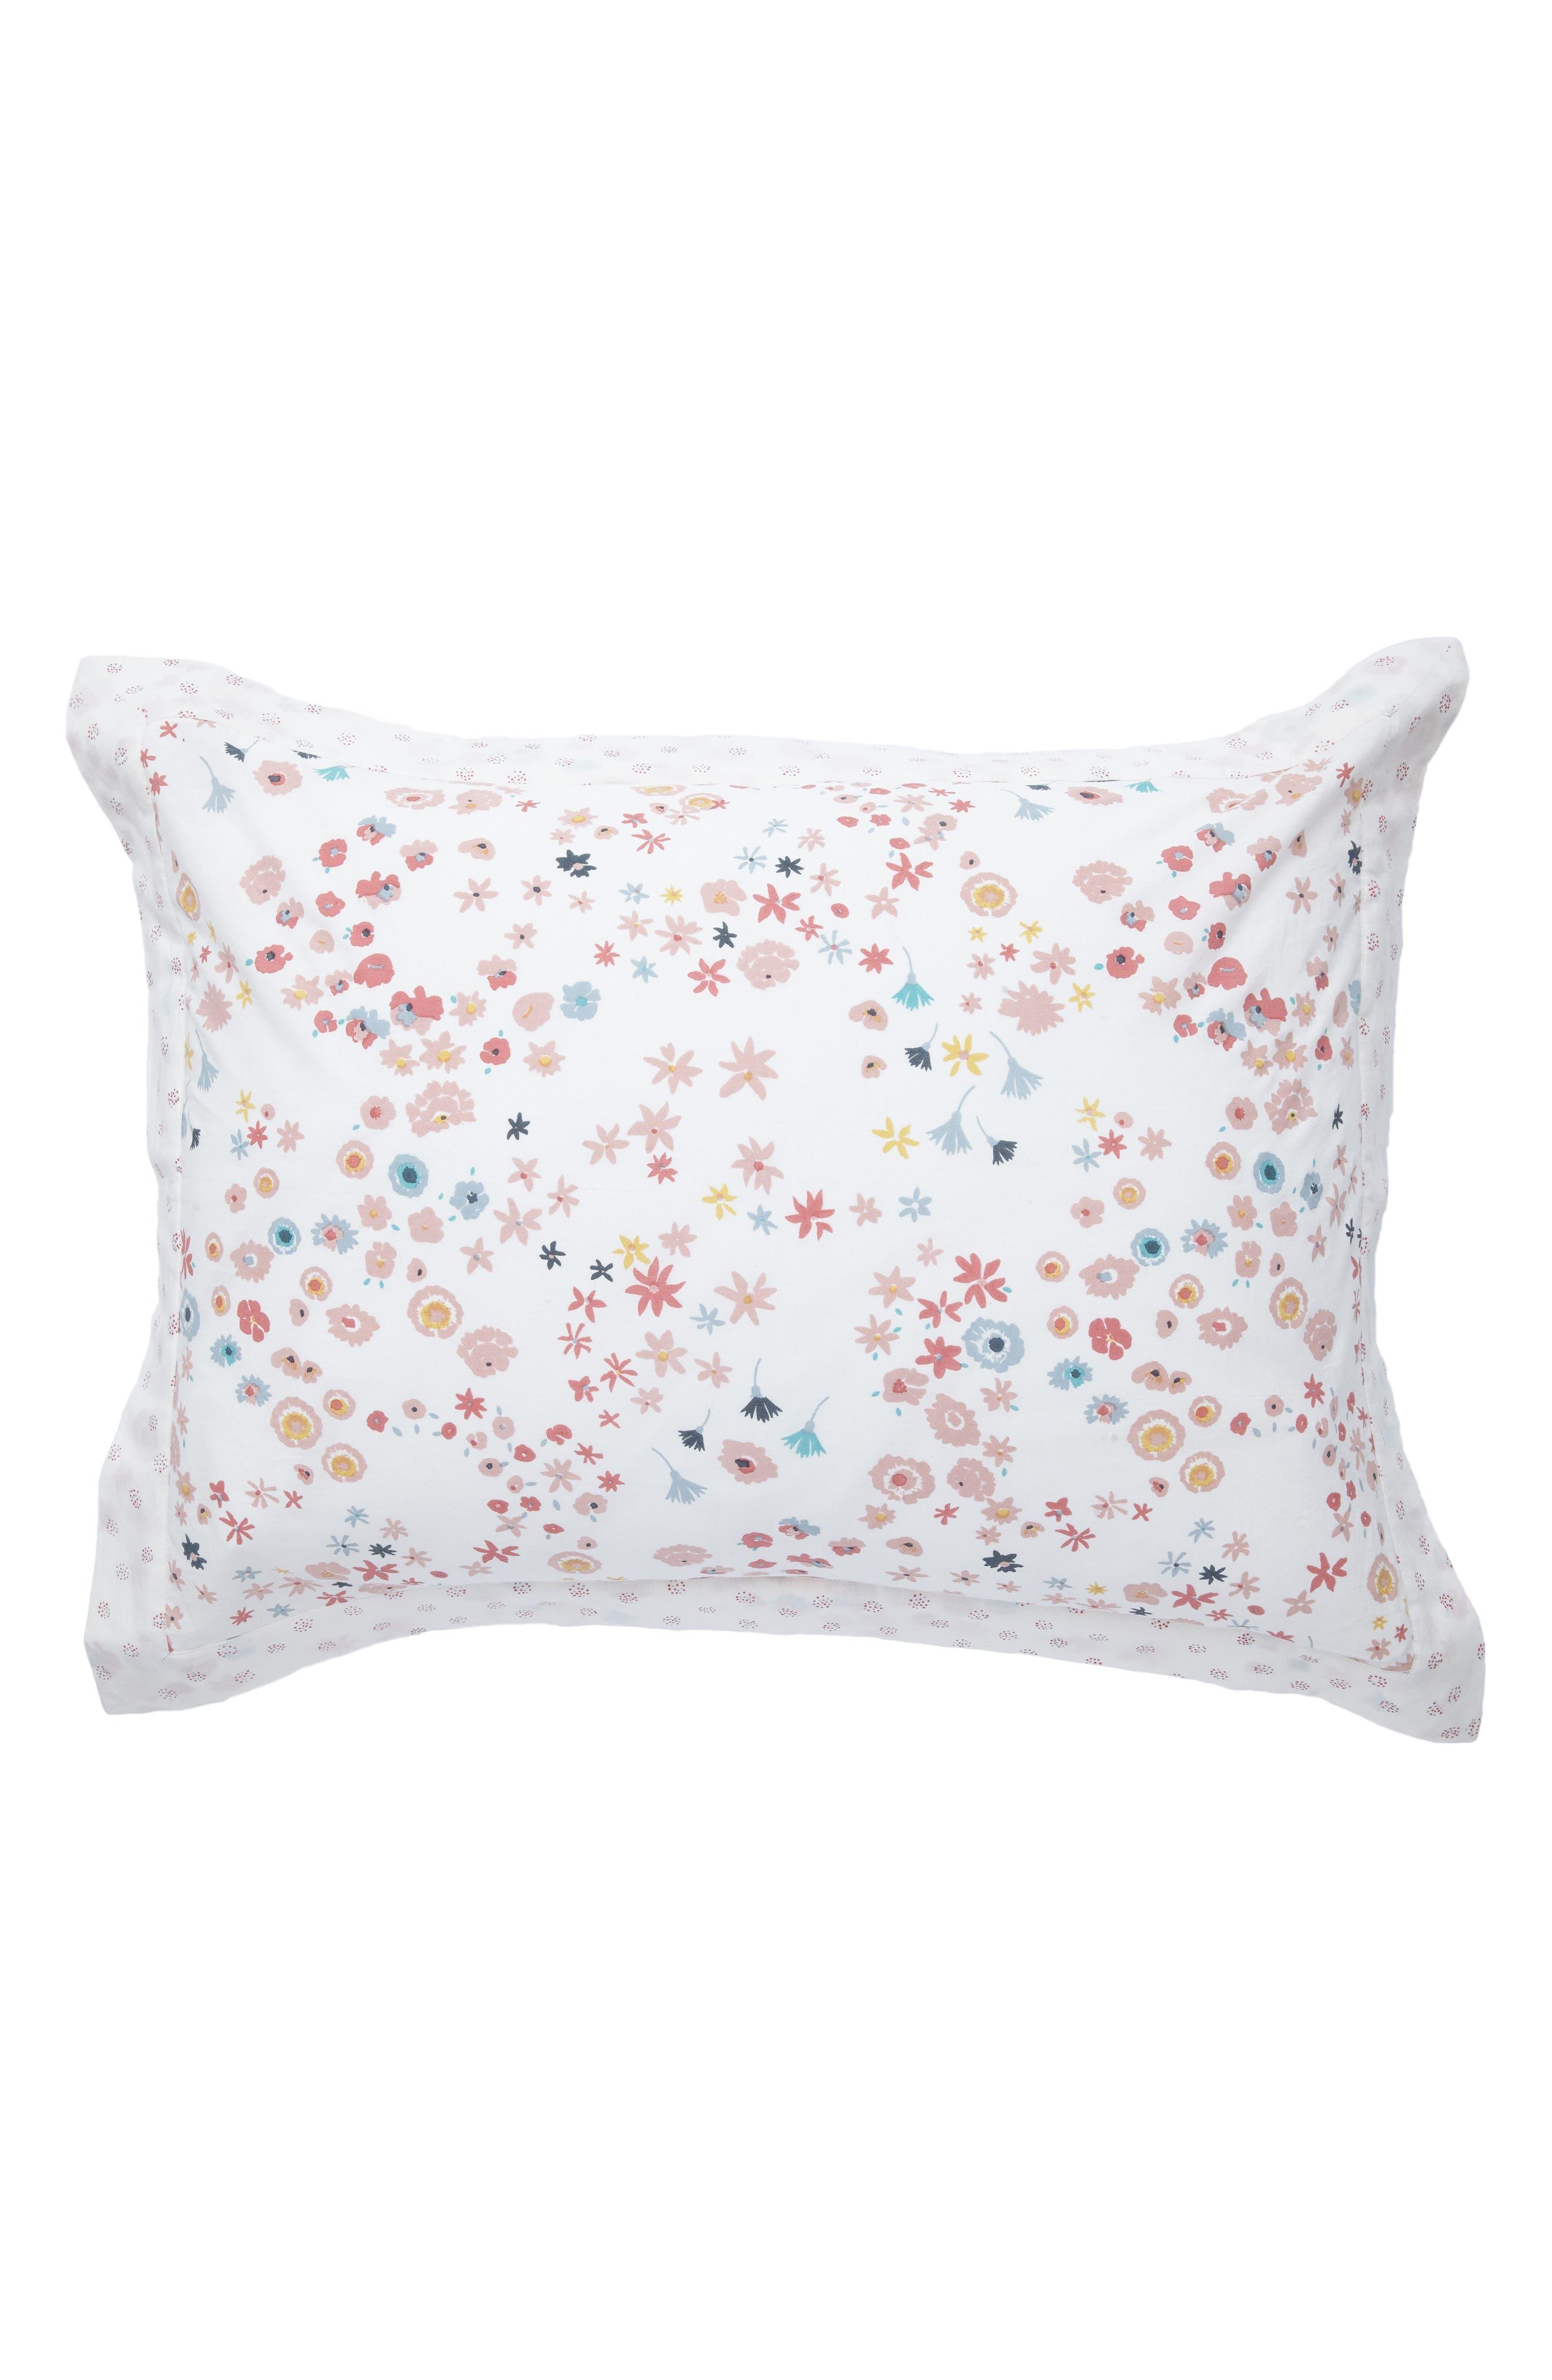 Main Image - Petit Pehr Reversible Standard Pillow Sham